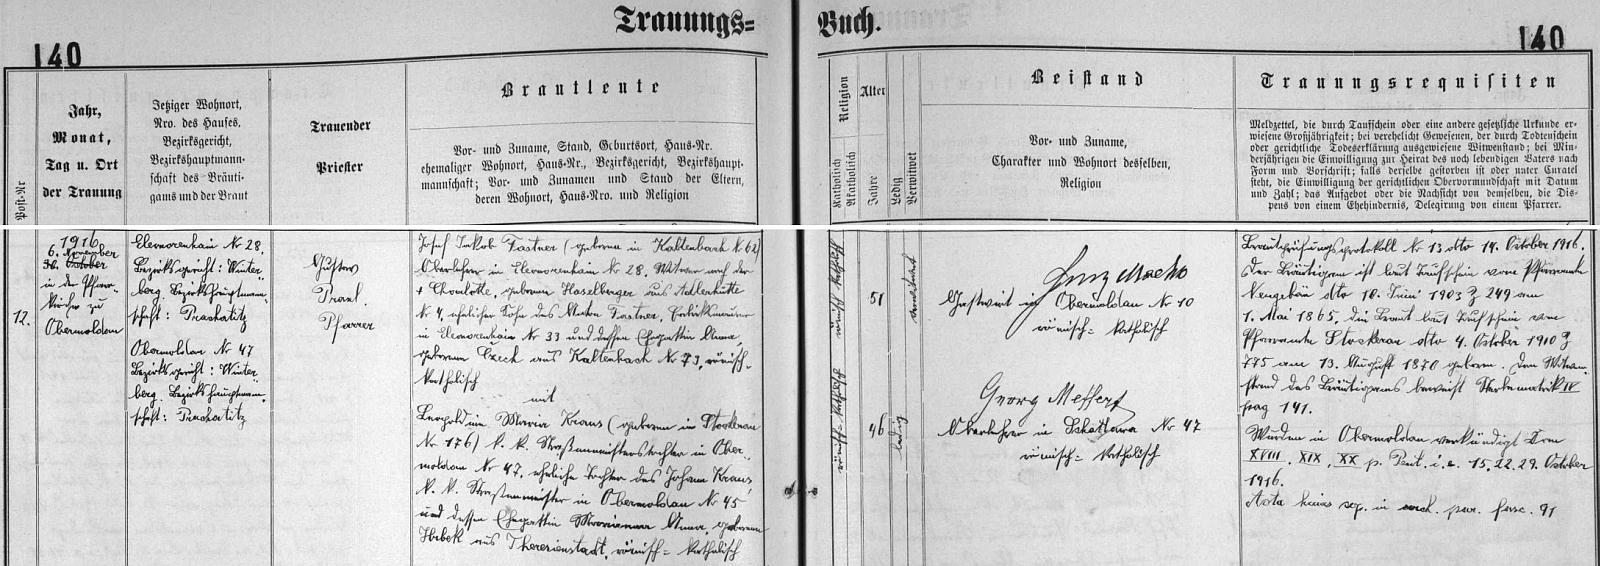 Záznam hornovltavické oddací matriky o jeho druhé svatbě s Leopoldinou Marií Krausovou